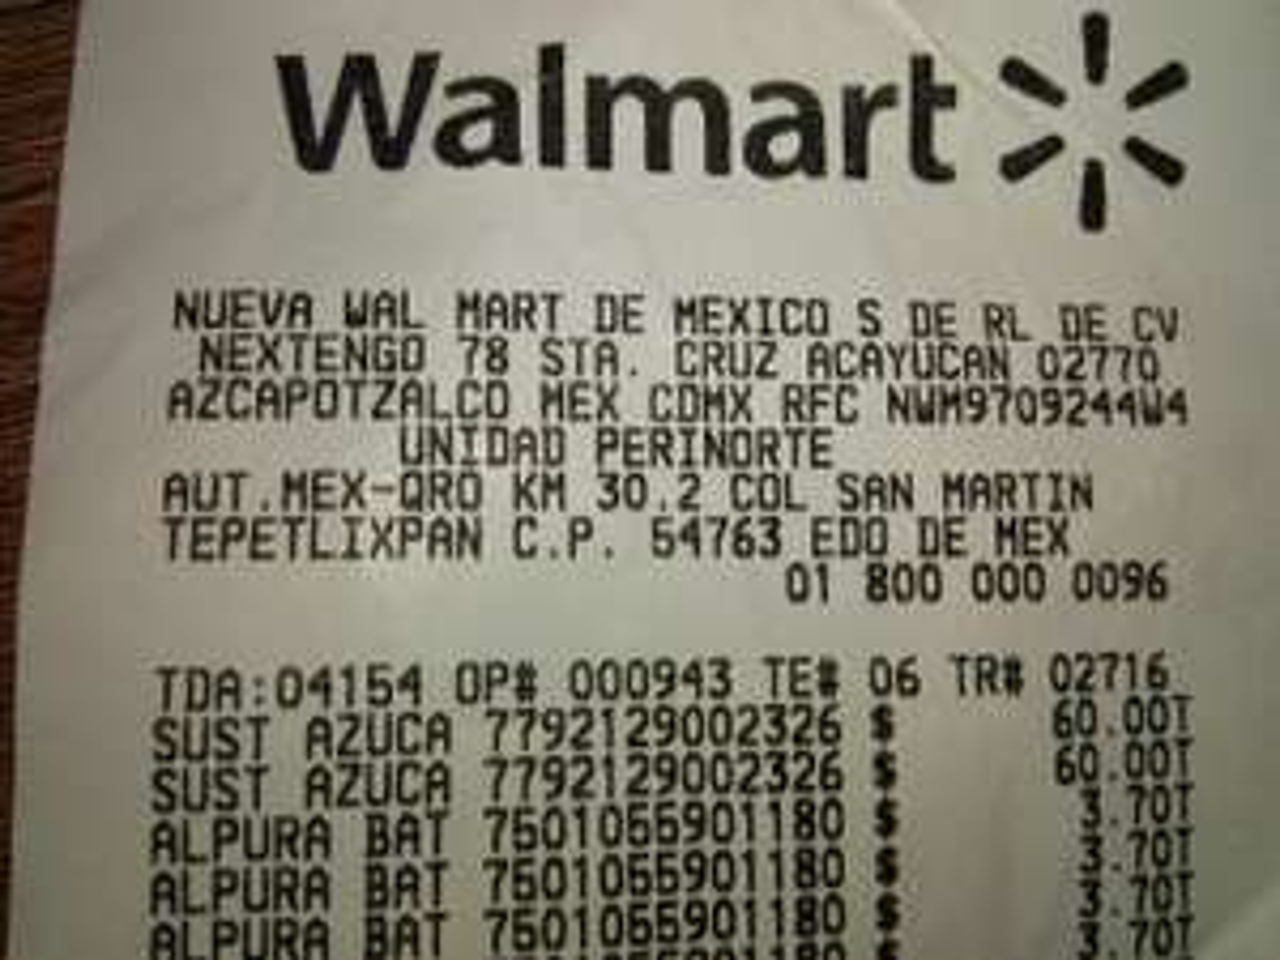 Walmart Arkana Izcalli: Canderel azul 200g a $60